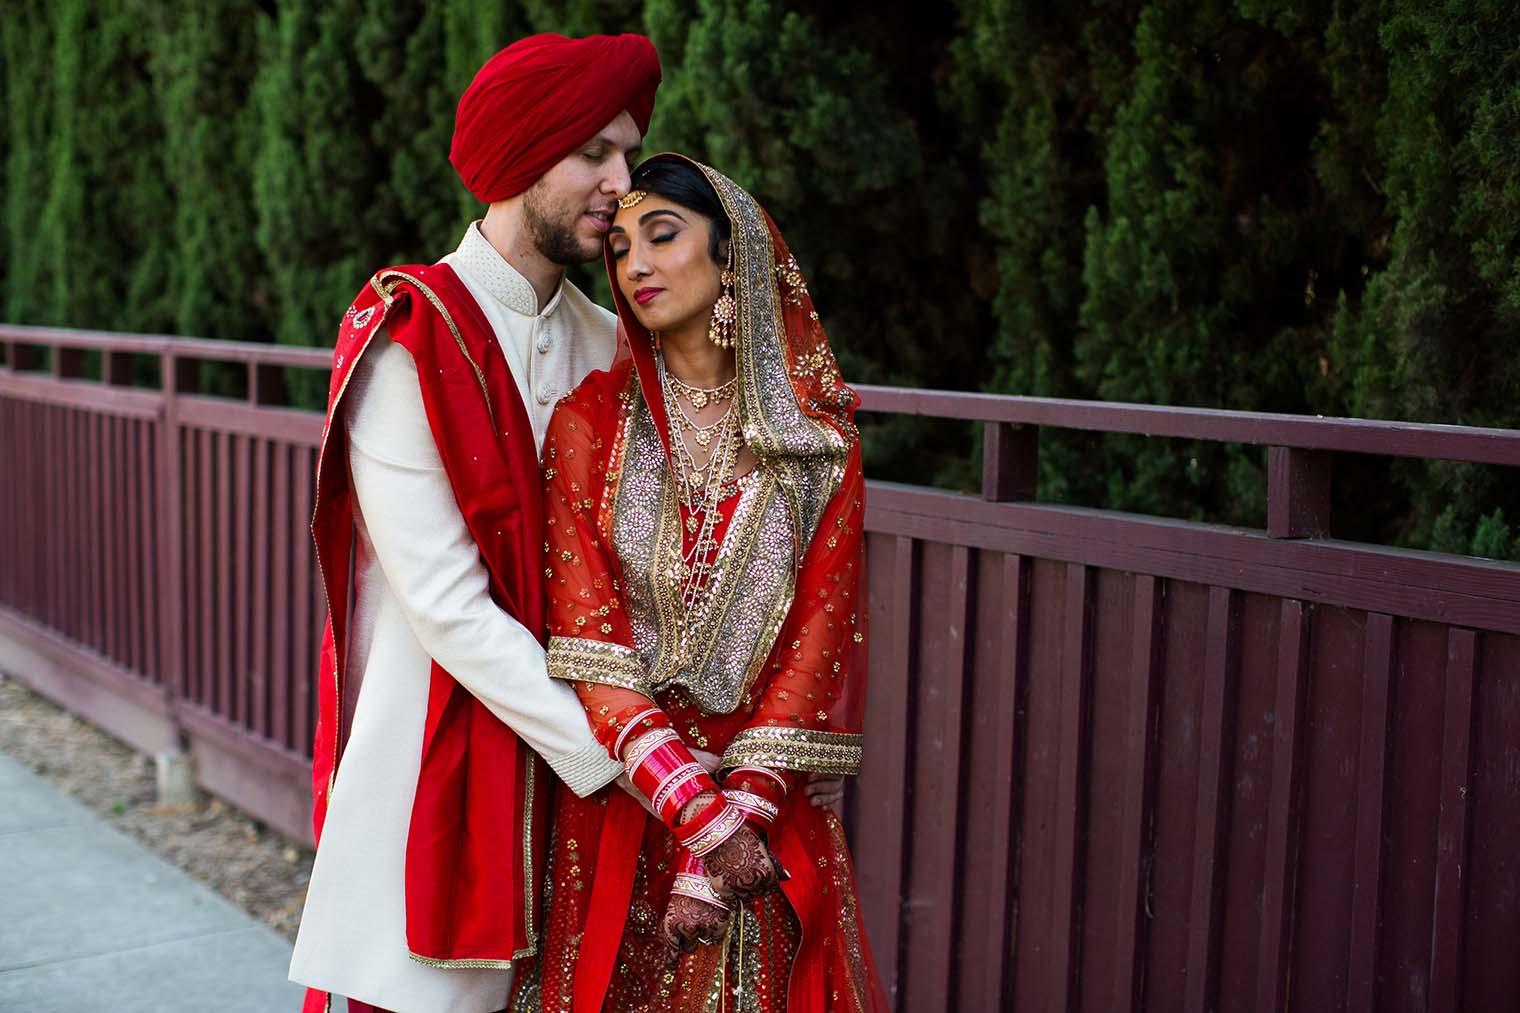 Indian Bride and Groom Portraits at Gurdwara Sahib of Fremont